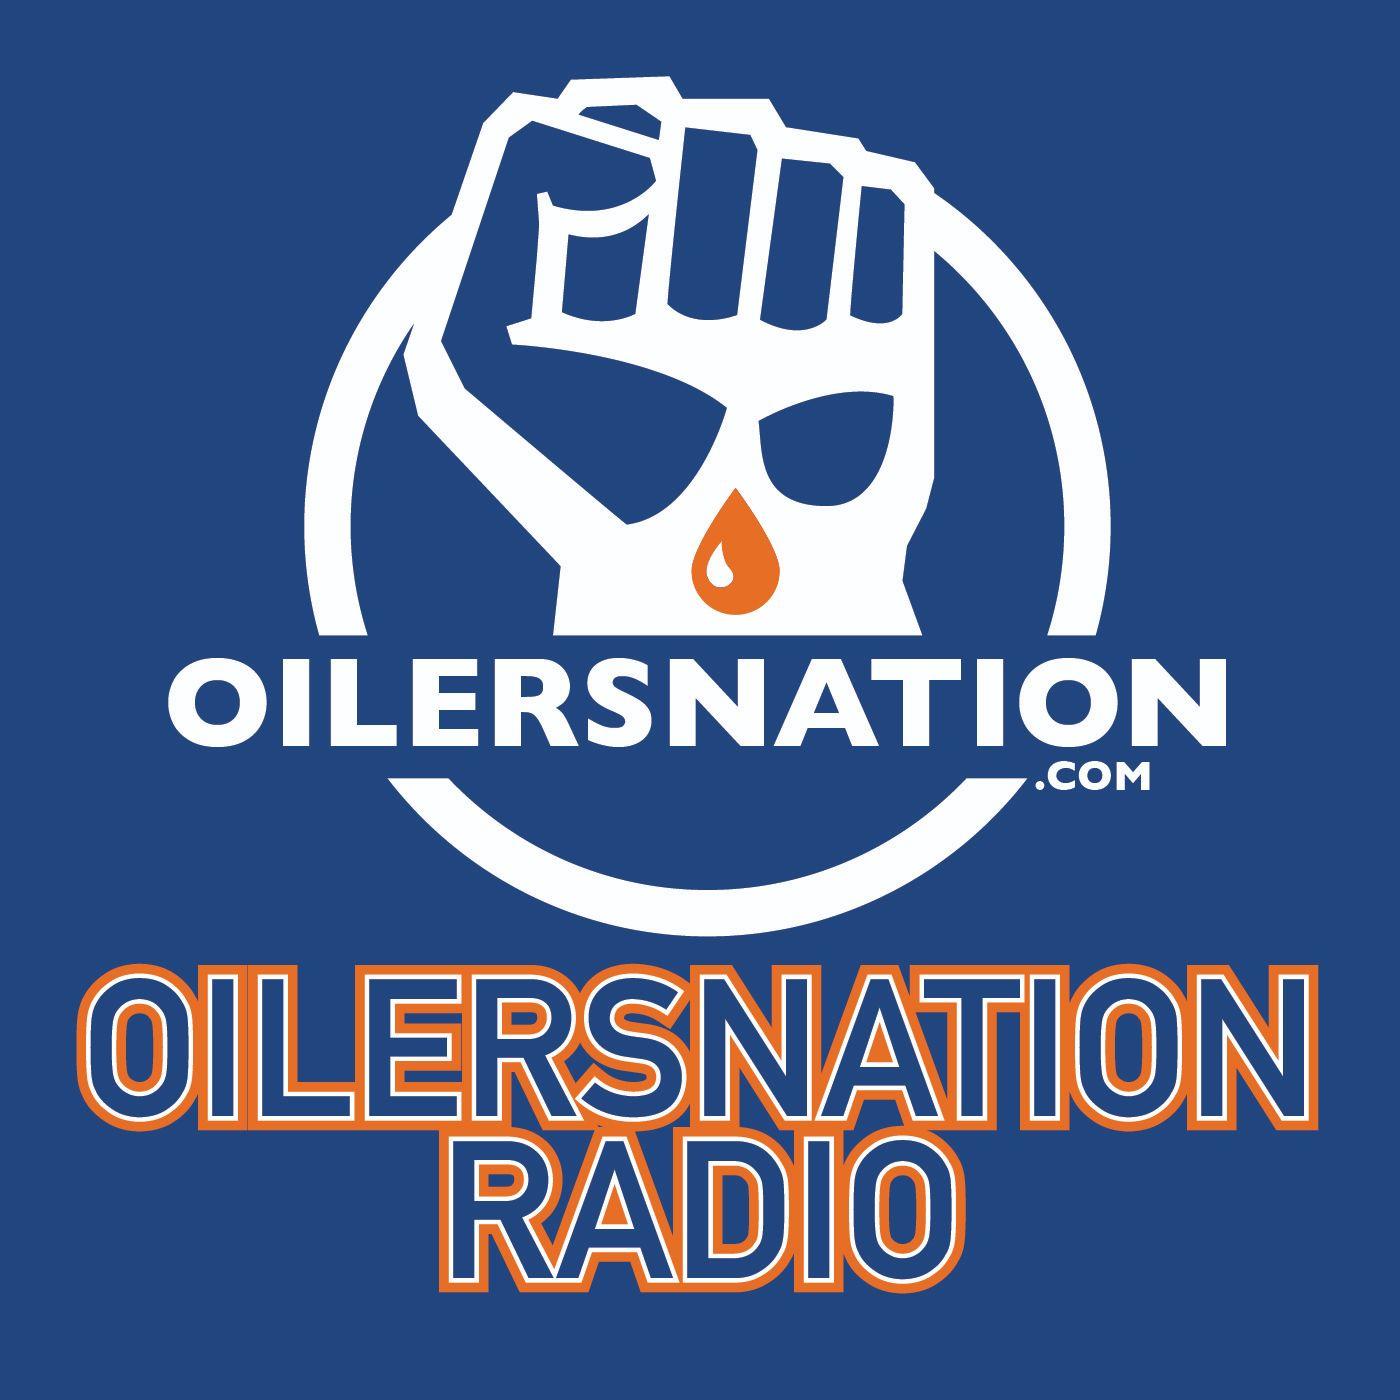 Oilersnation Radio show art